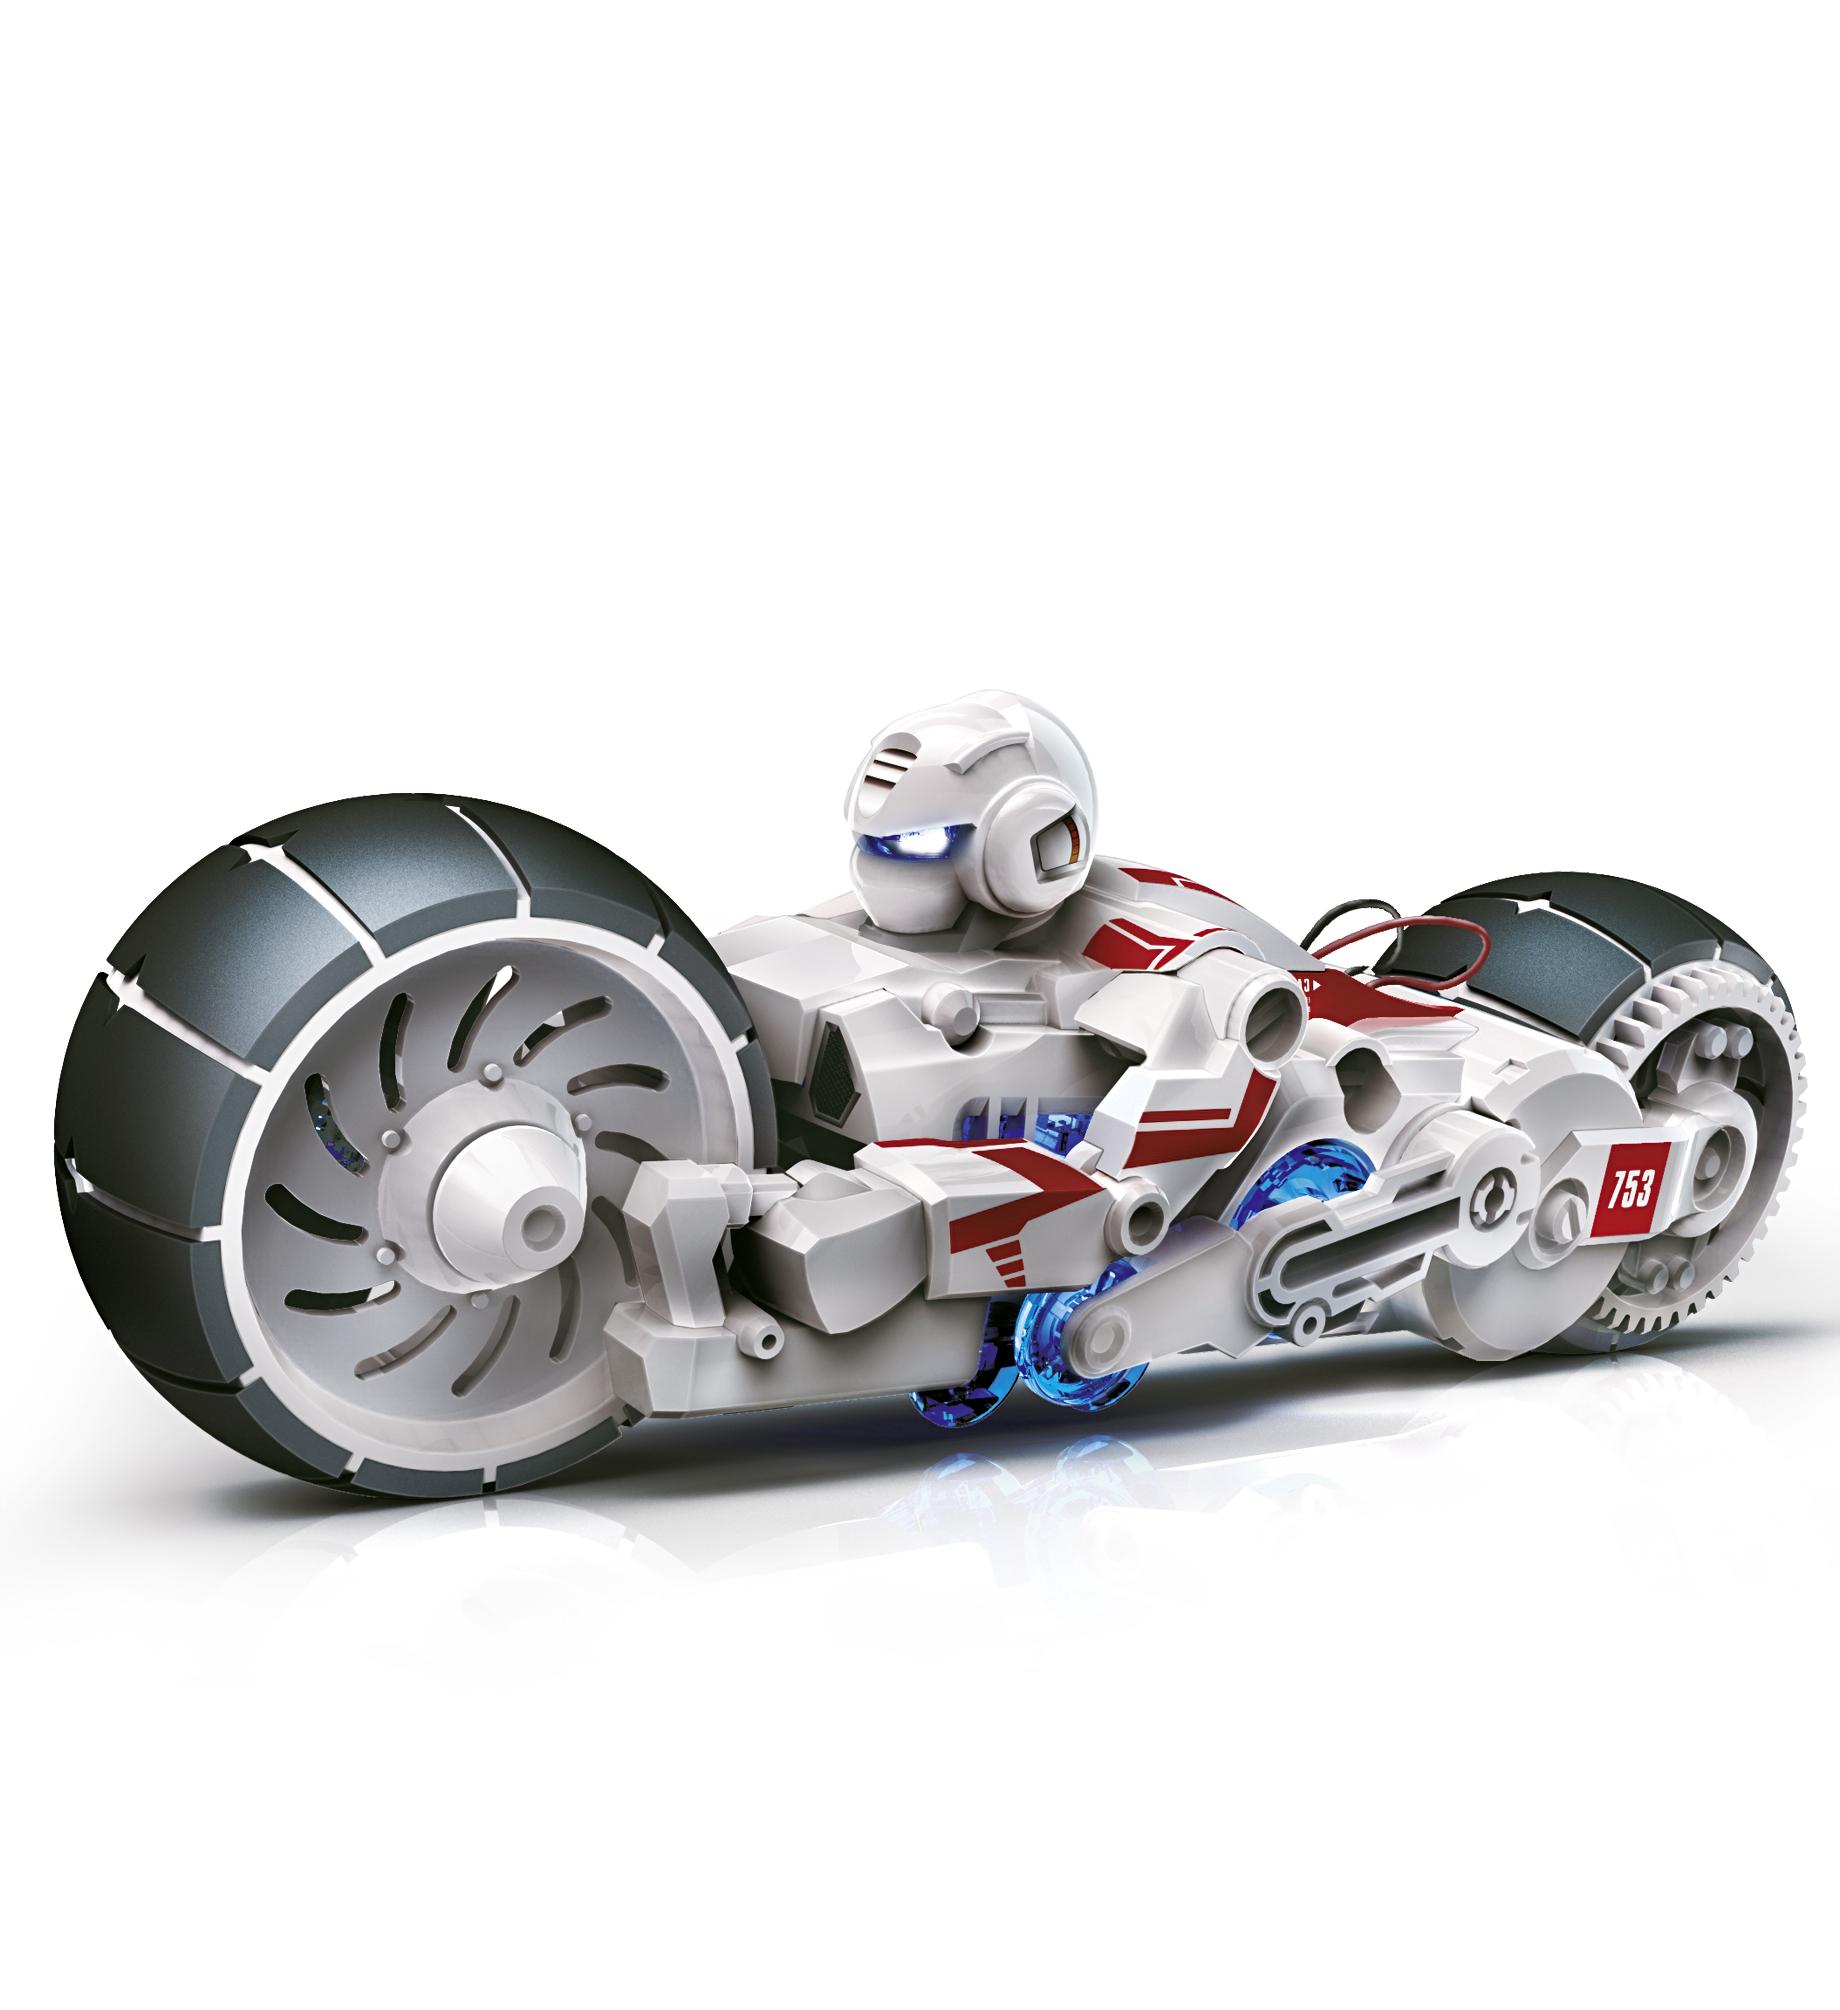 INPRO SOLAR motorfiets op zoutwater